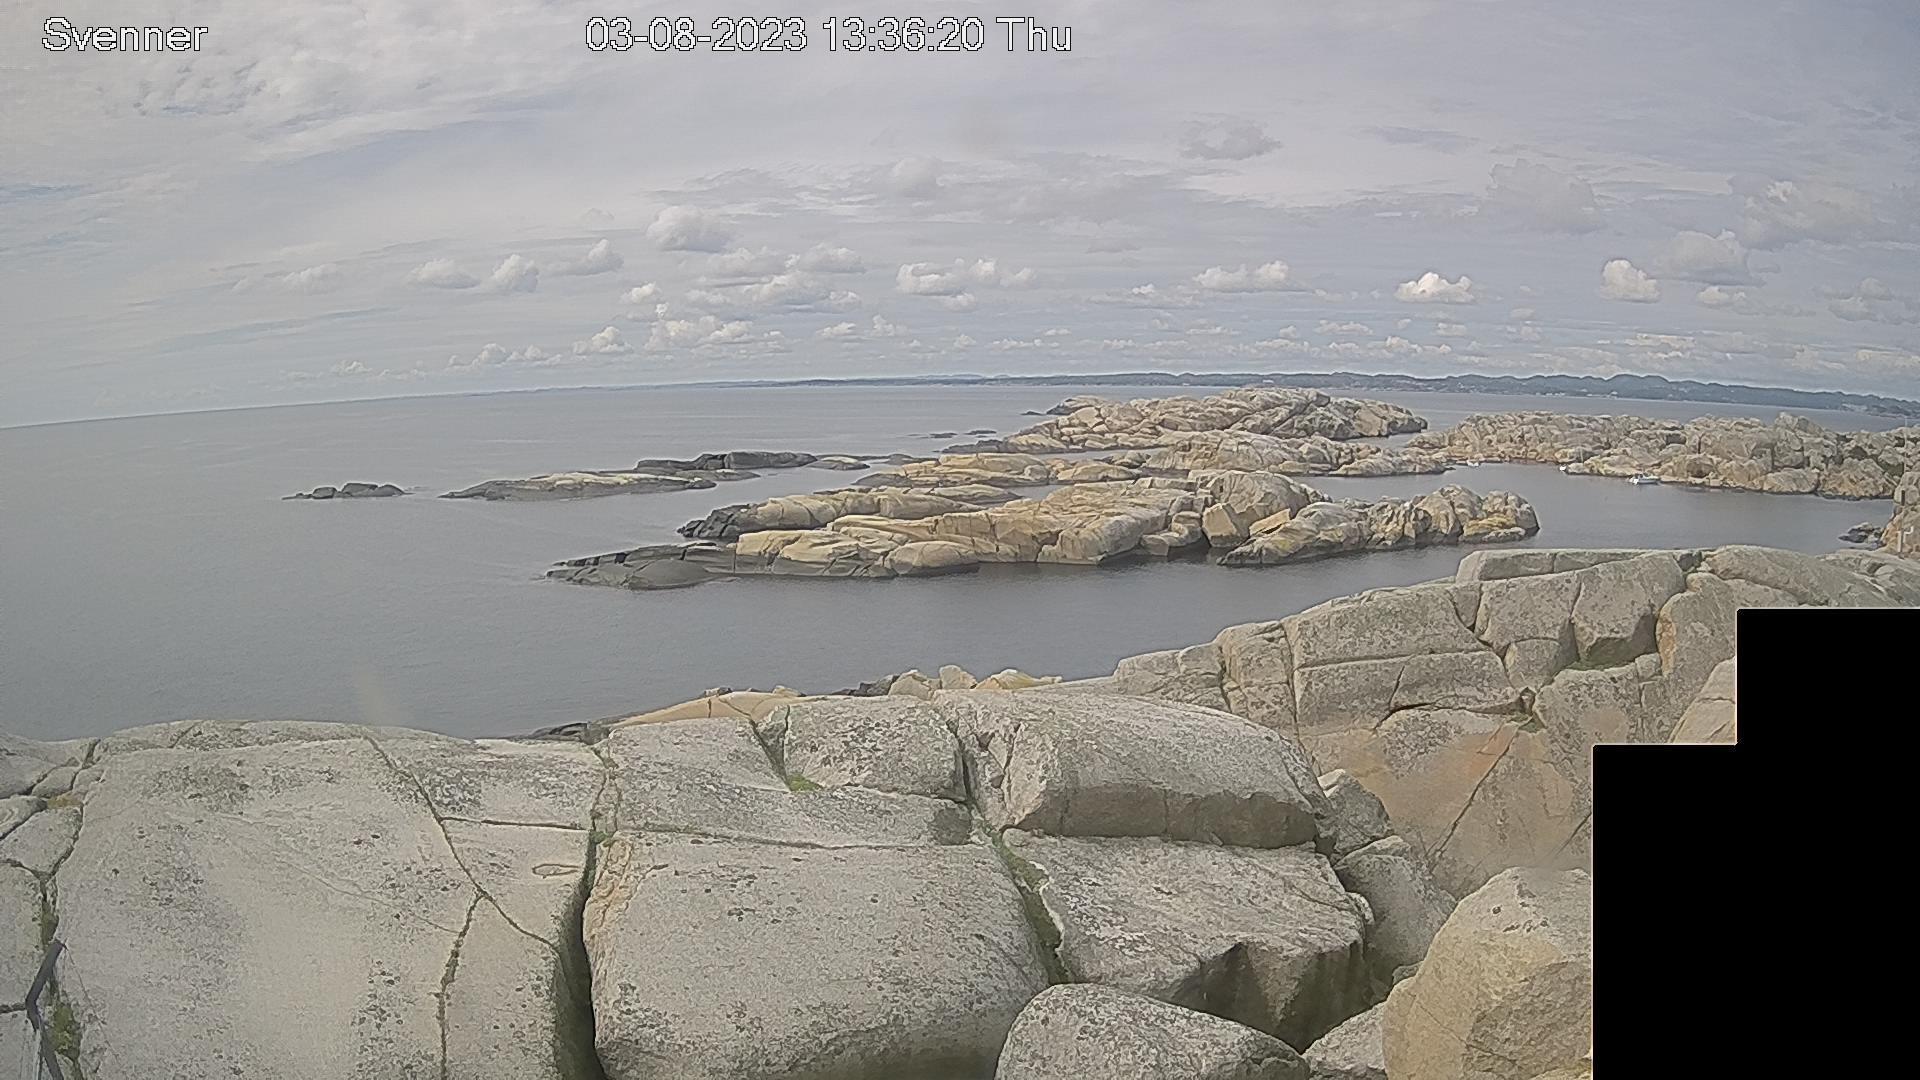 Webkamera Svenner › West: Svenner Lighthouse